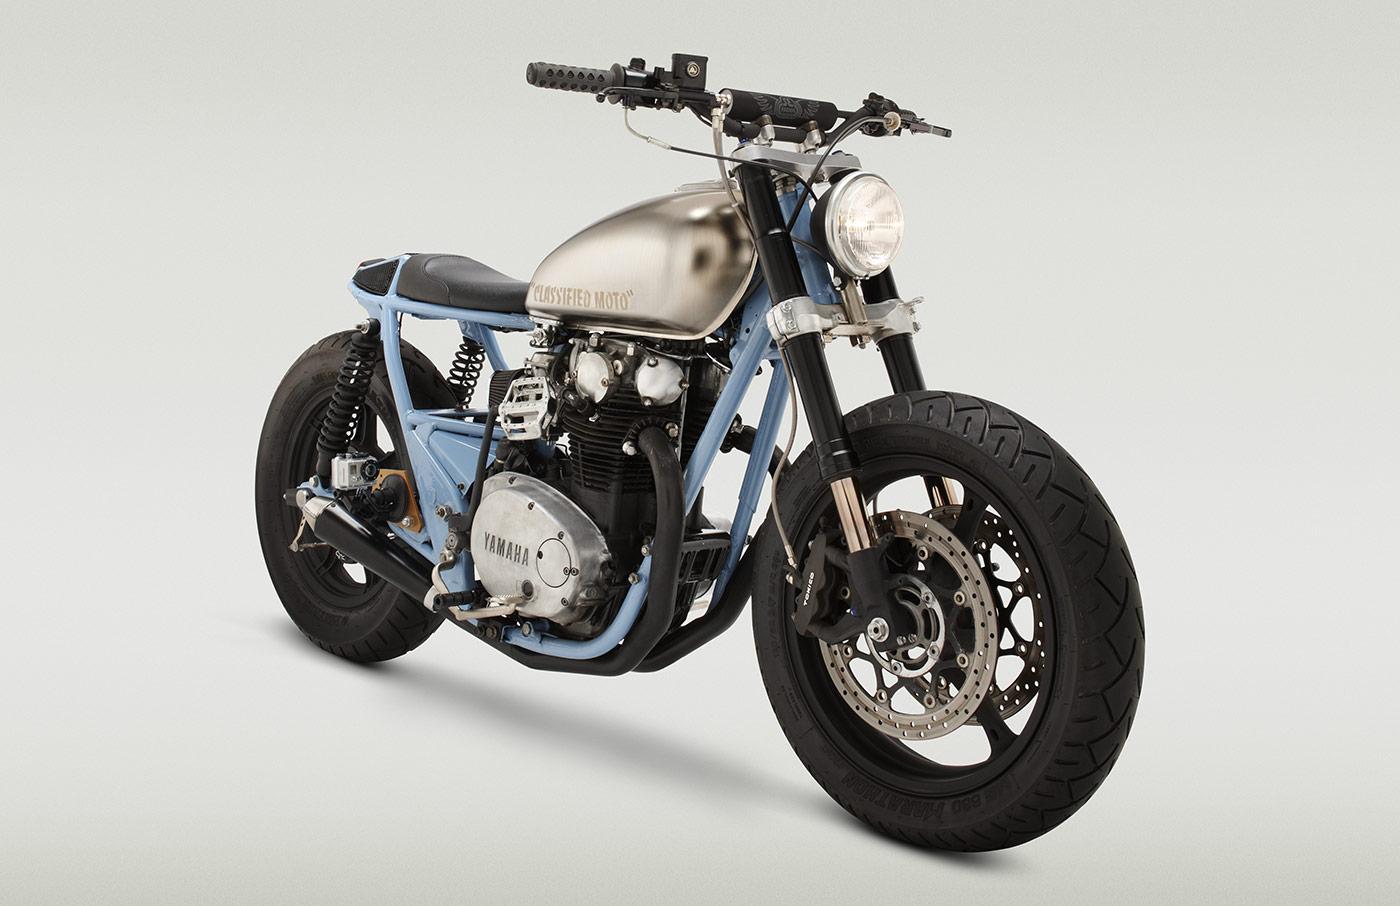 XS650 The Ripper - Classified Moto